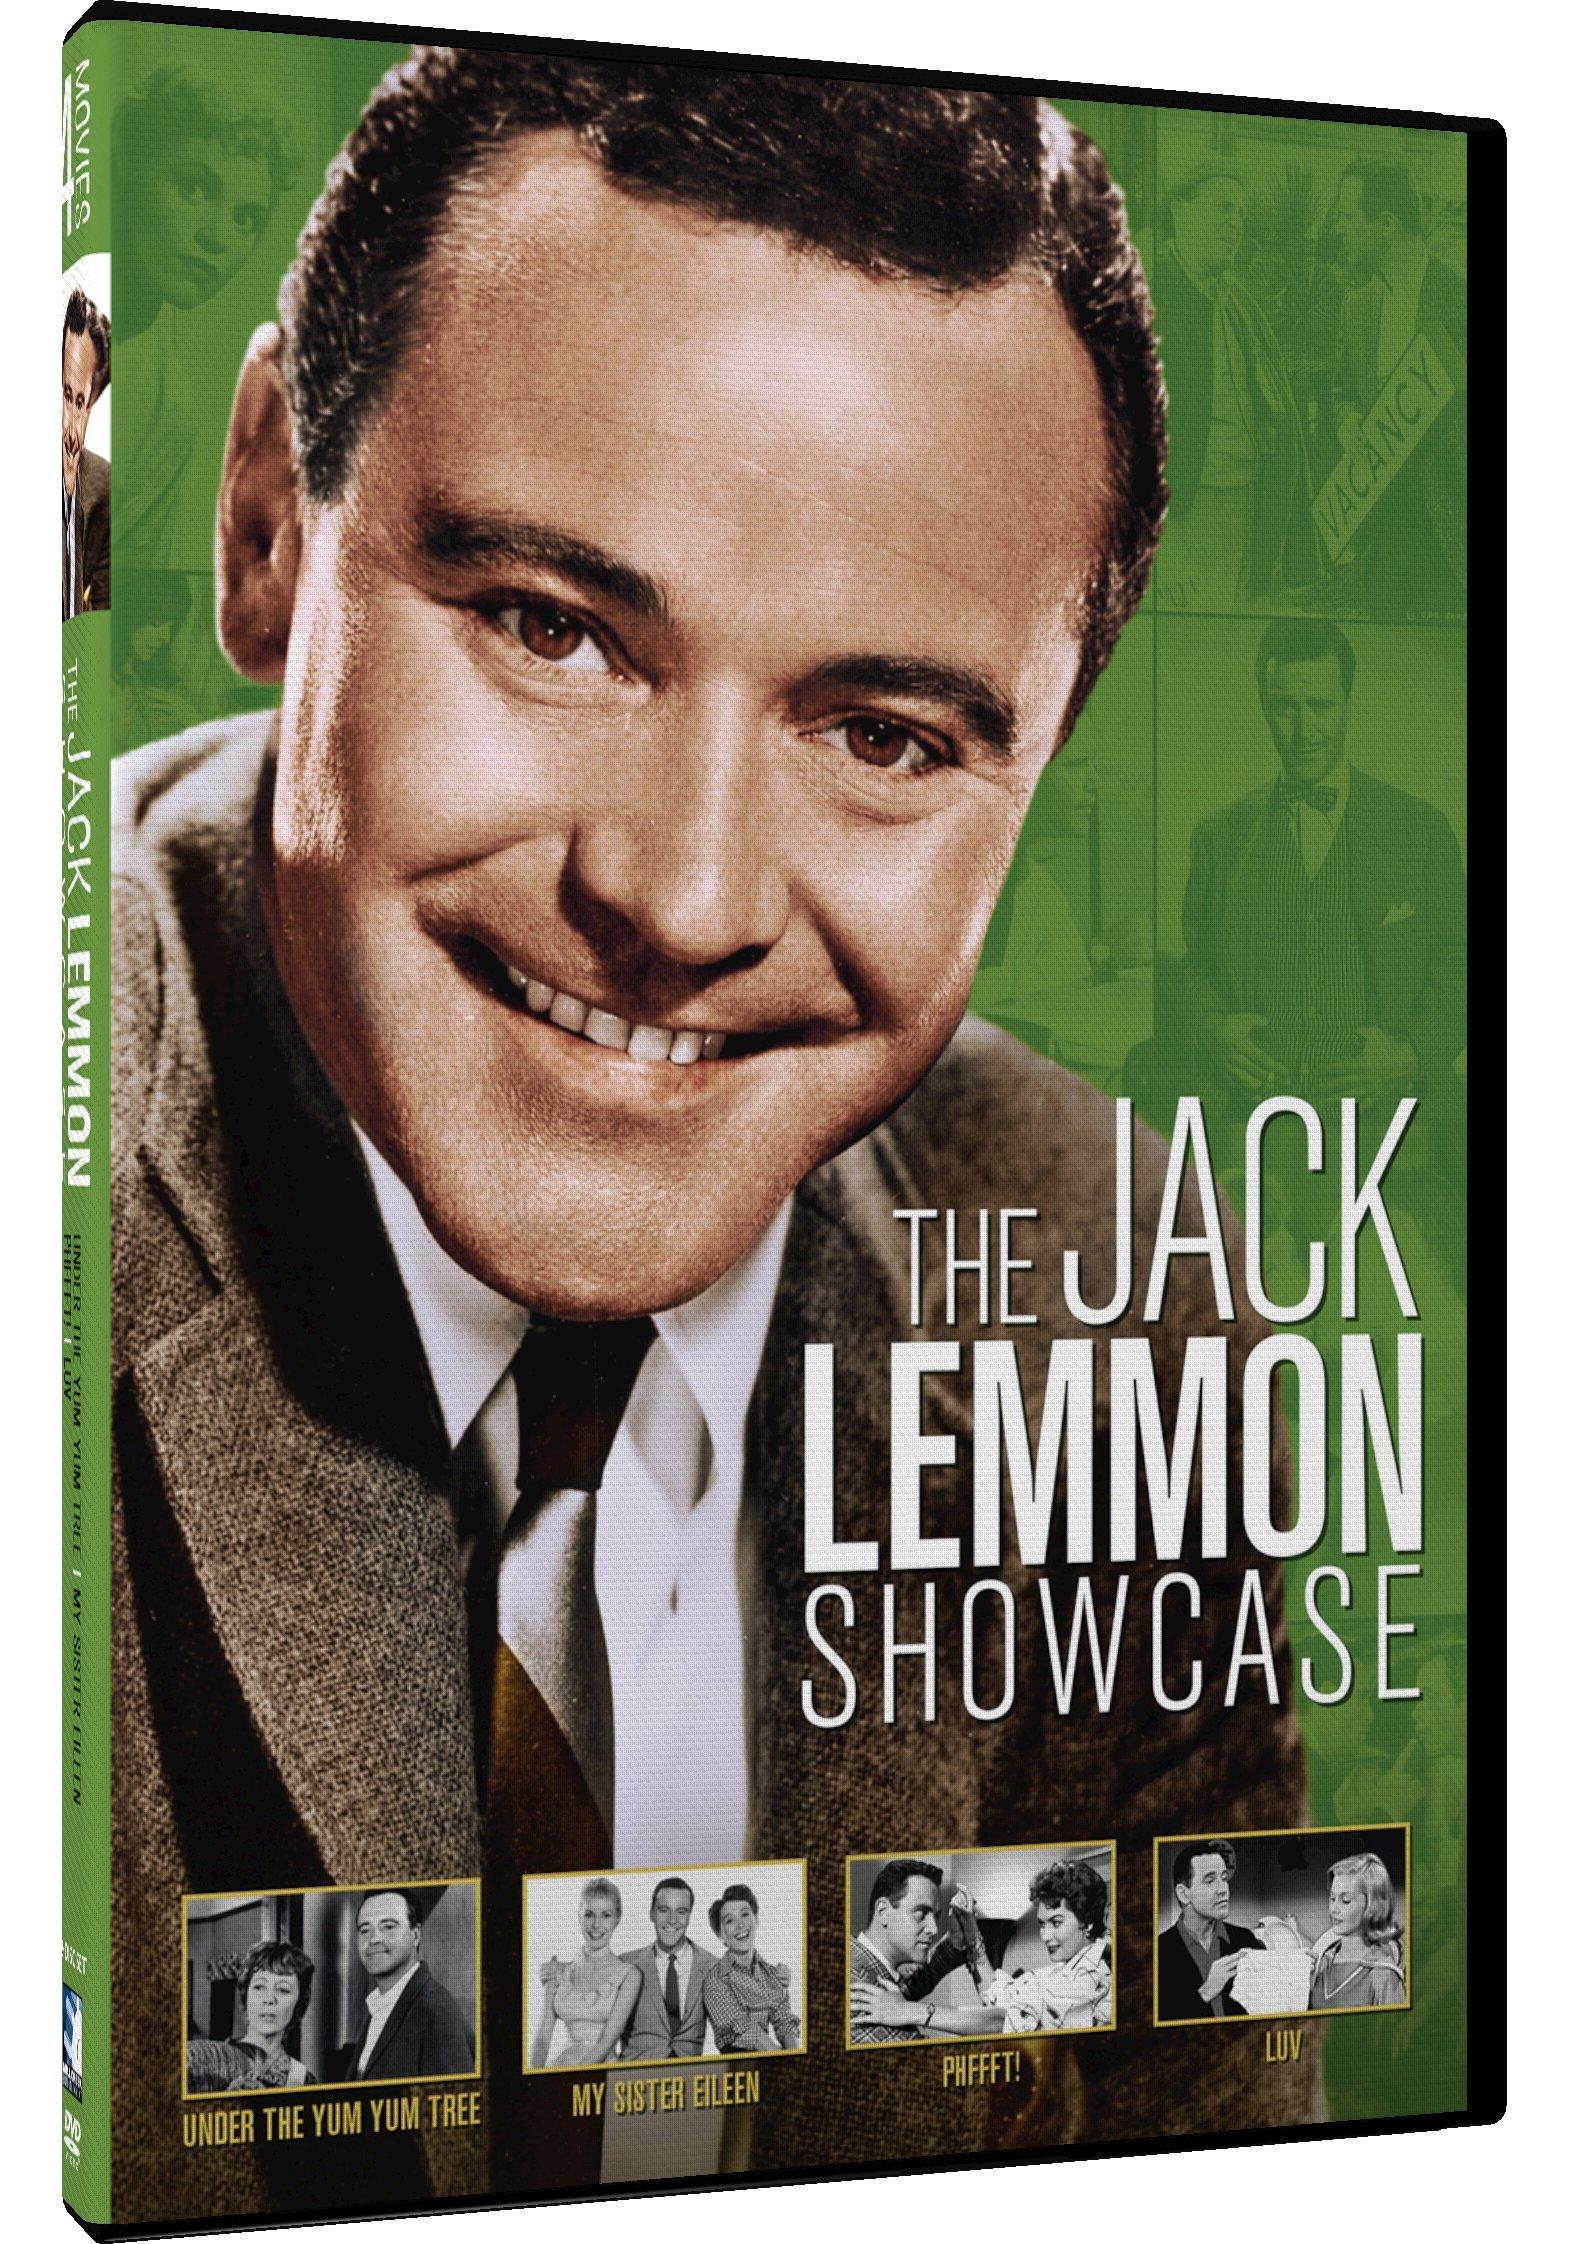 Jack Lemmon Showcase Volume 1 - 4-Movie Set - Under the Yum Yum Tree/My Sister Eileen/PHFFFT!/Luv